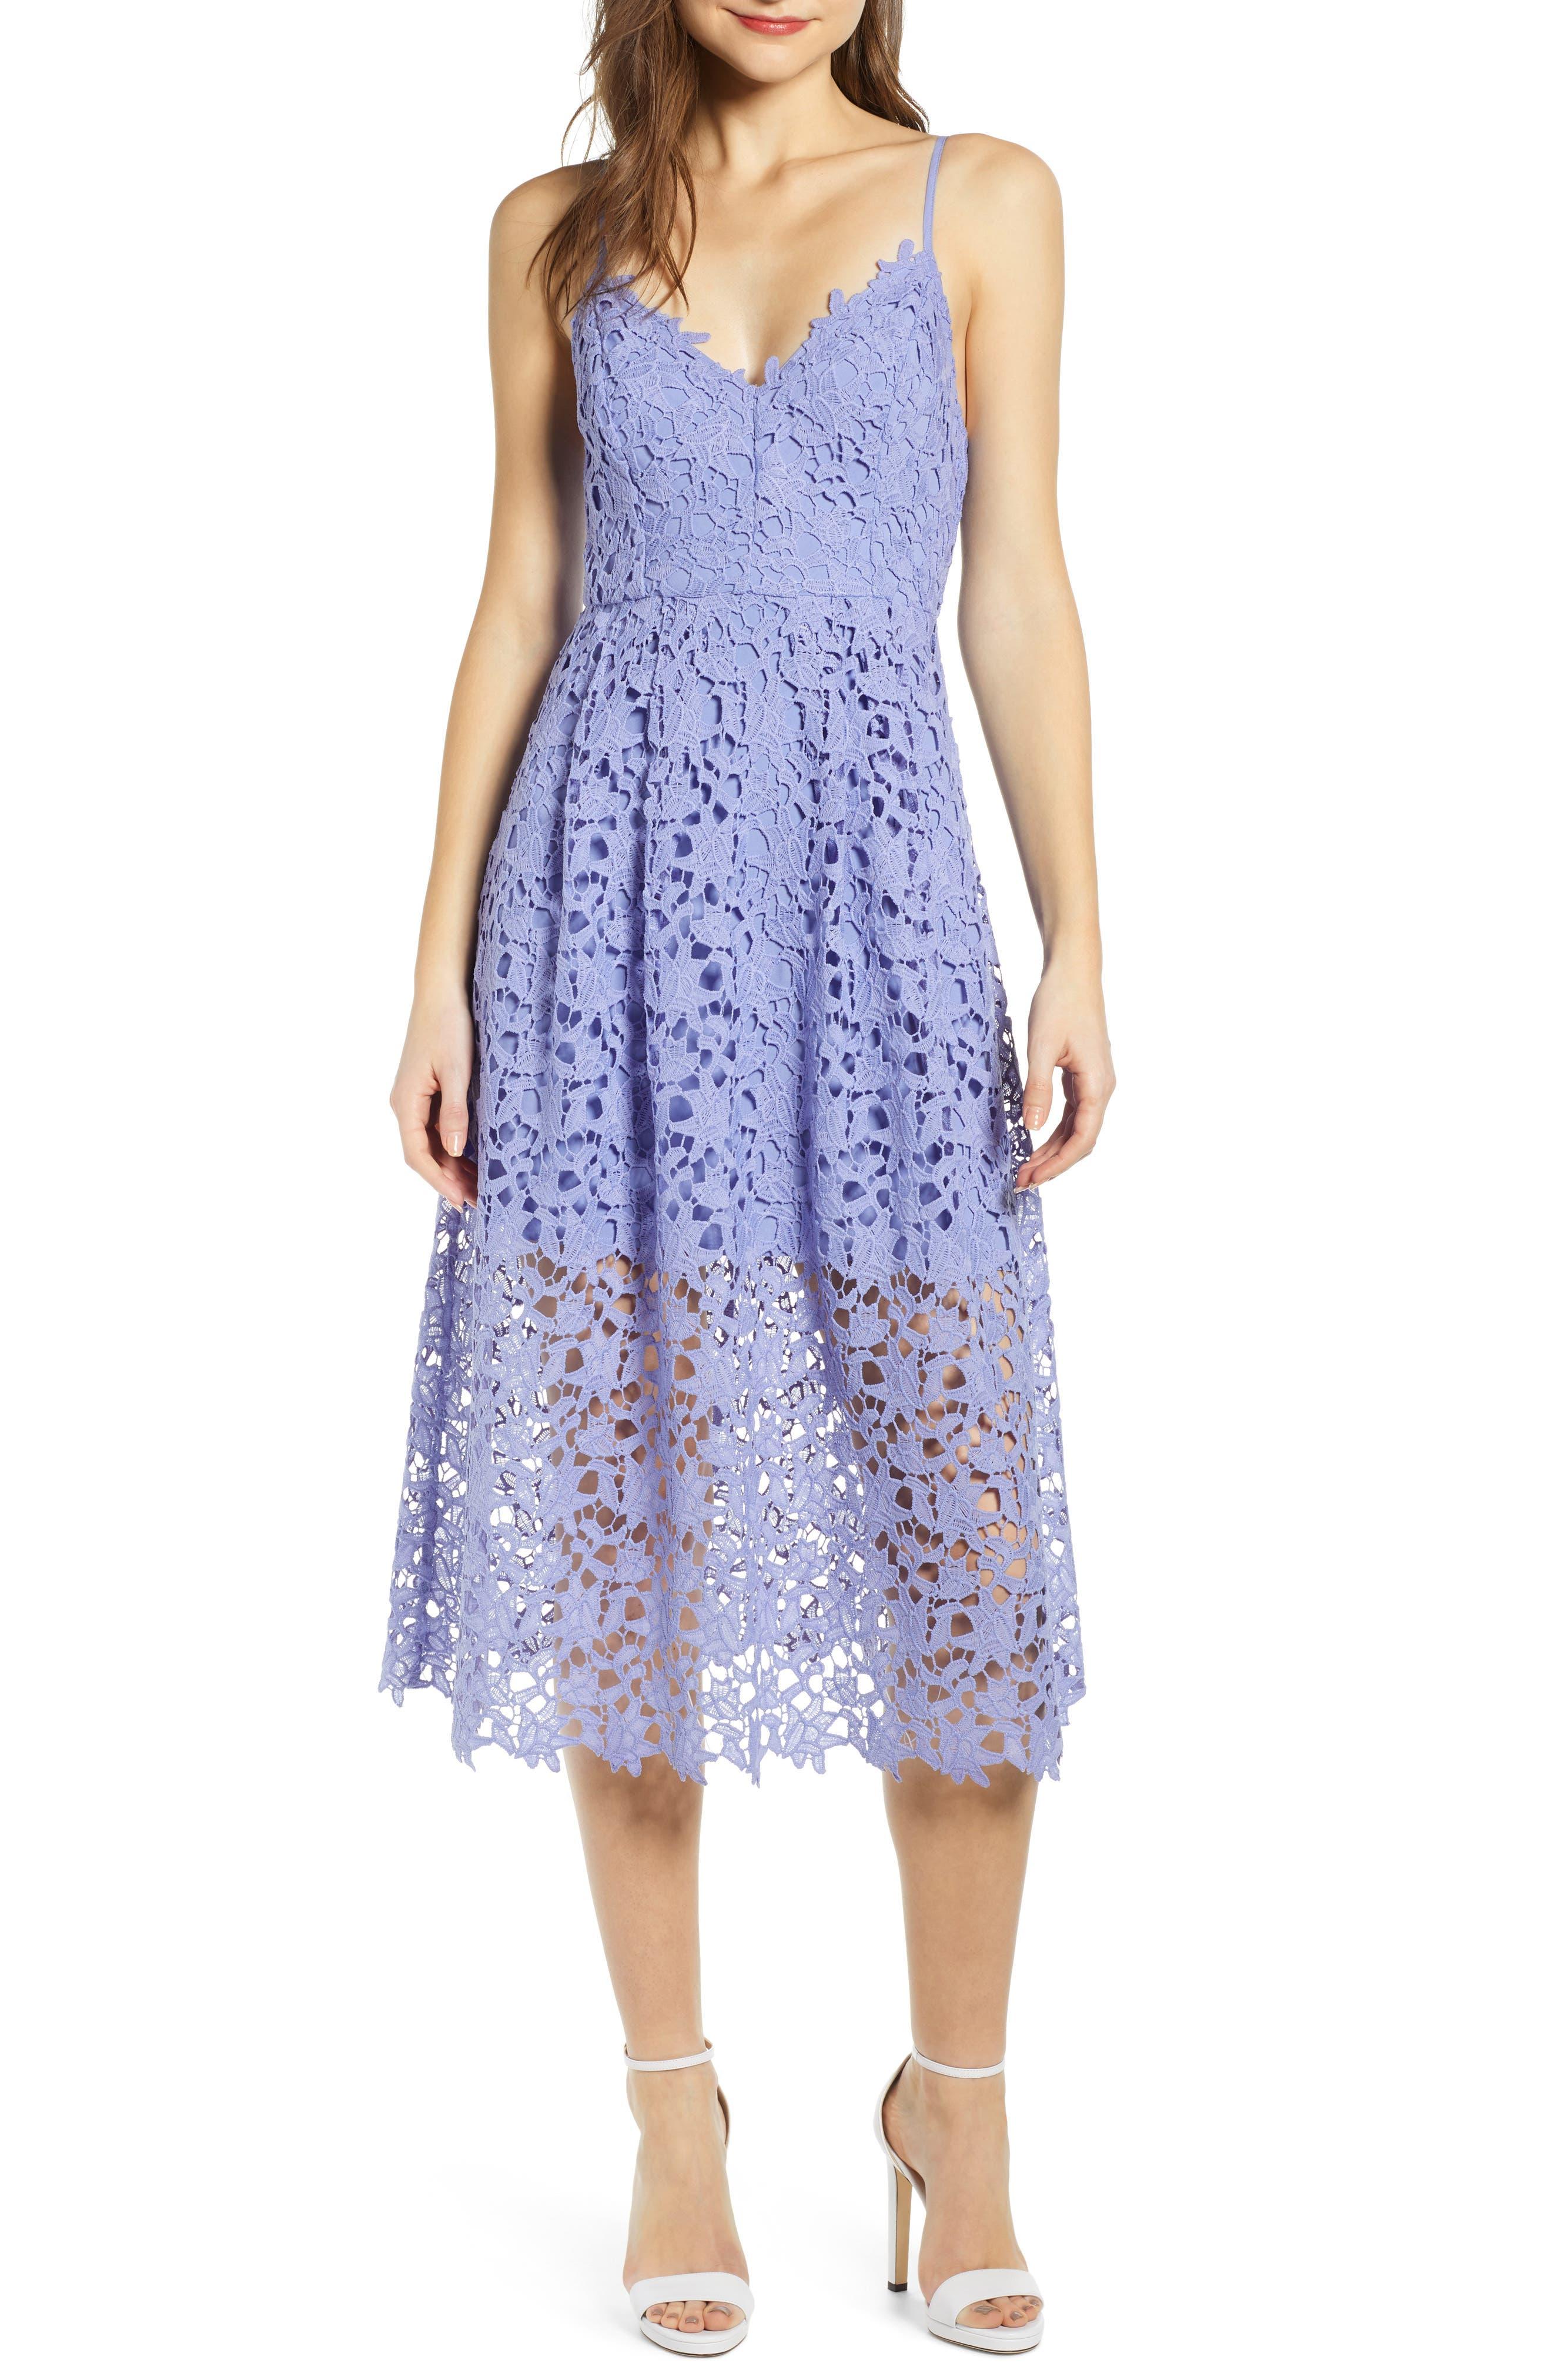 ASTR THE LABEL Lace Midi Dress, Main, color, LAVENDER